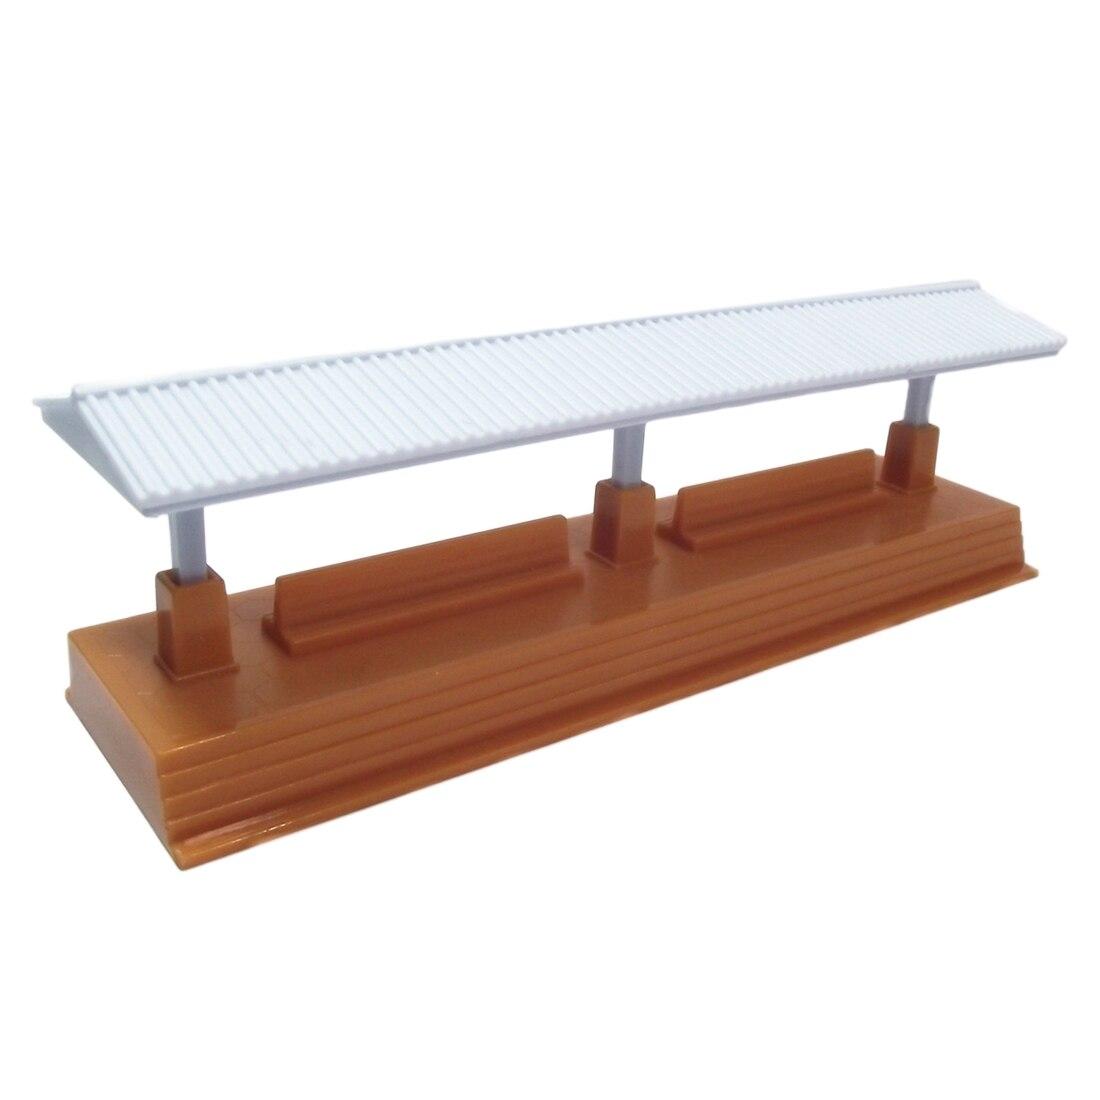 1:50-1:87 HO Scale Bus Stop Train Station Railway Platform Layout Model For DIY Architectural Sand Table - Random Color